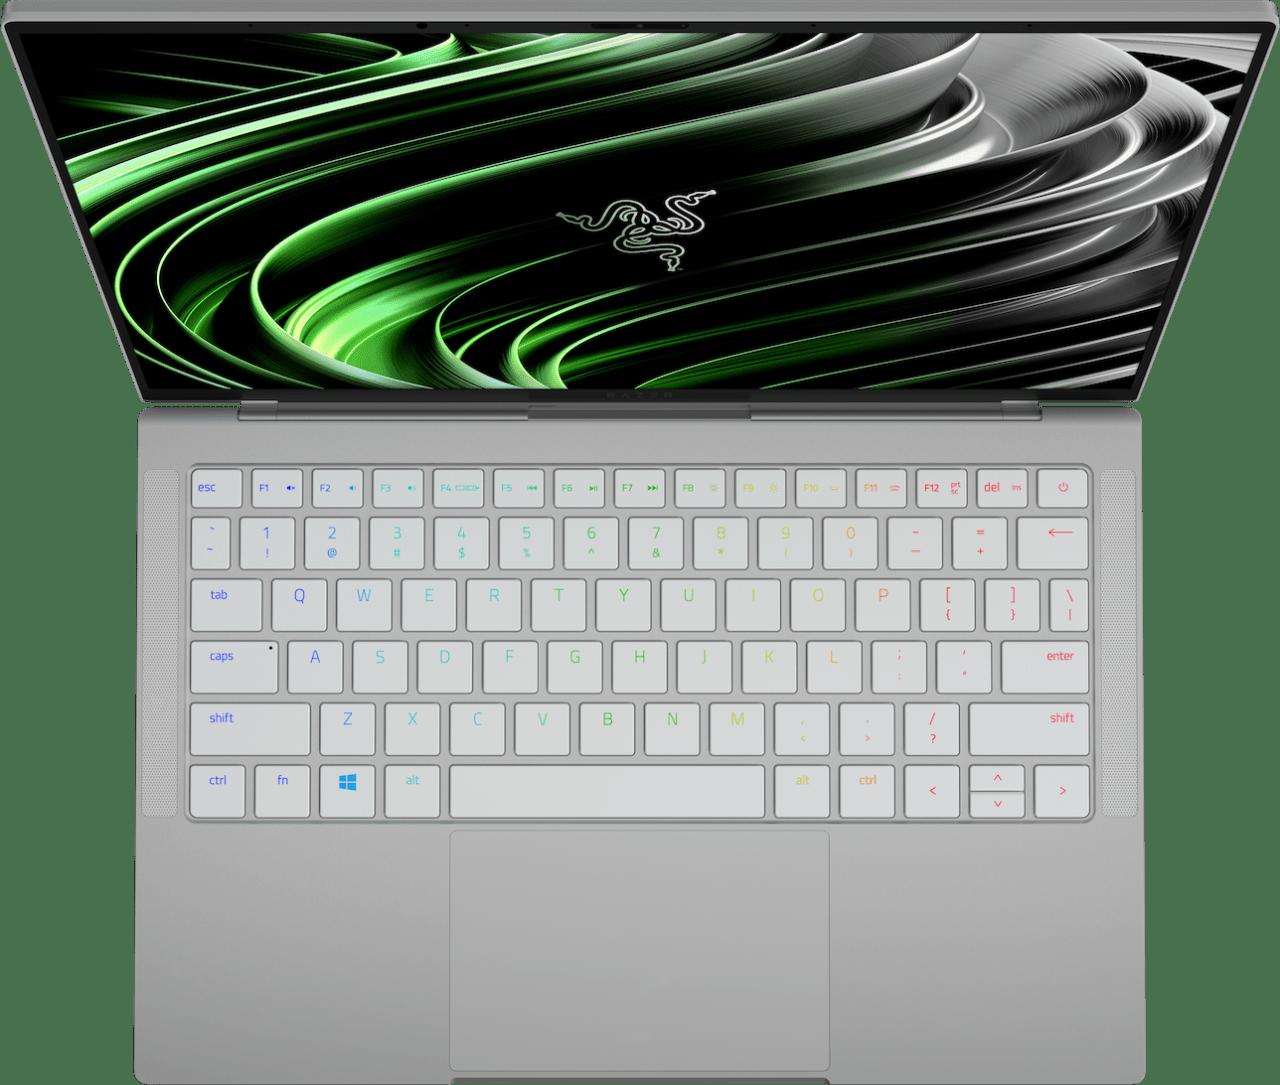 Mercury White Razer Book 13 - English (QWERTY) Laptop - Intel® Core™ i7-1165G7 - 16GB - 512GB SSD - Intel® Iris® Xe Graphics.2